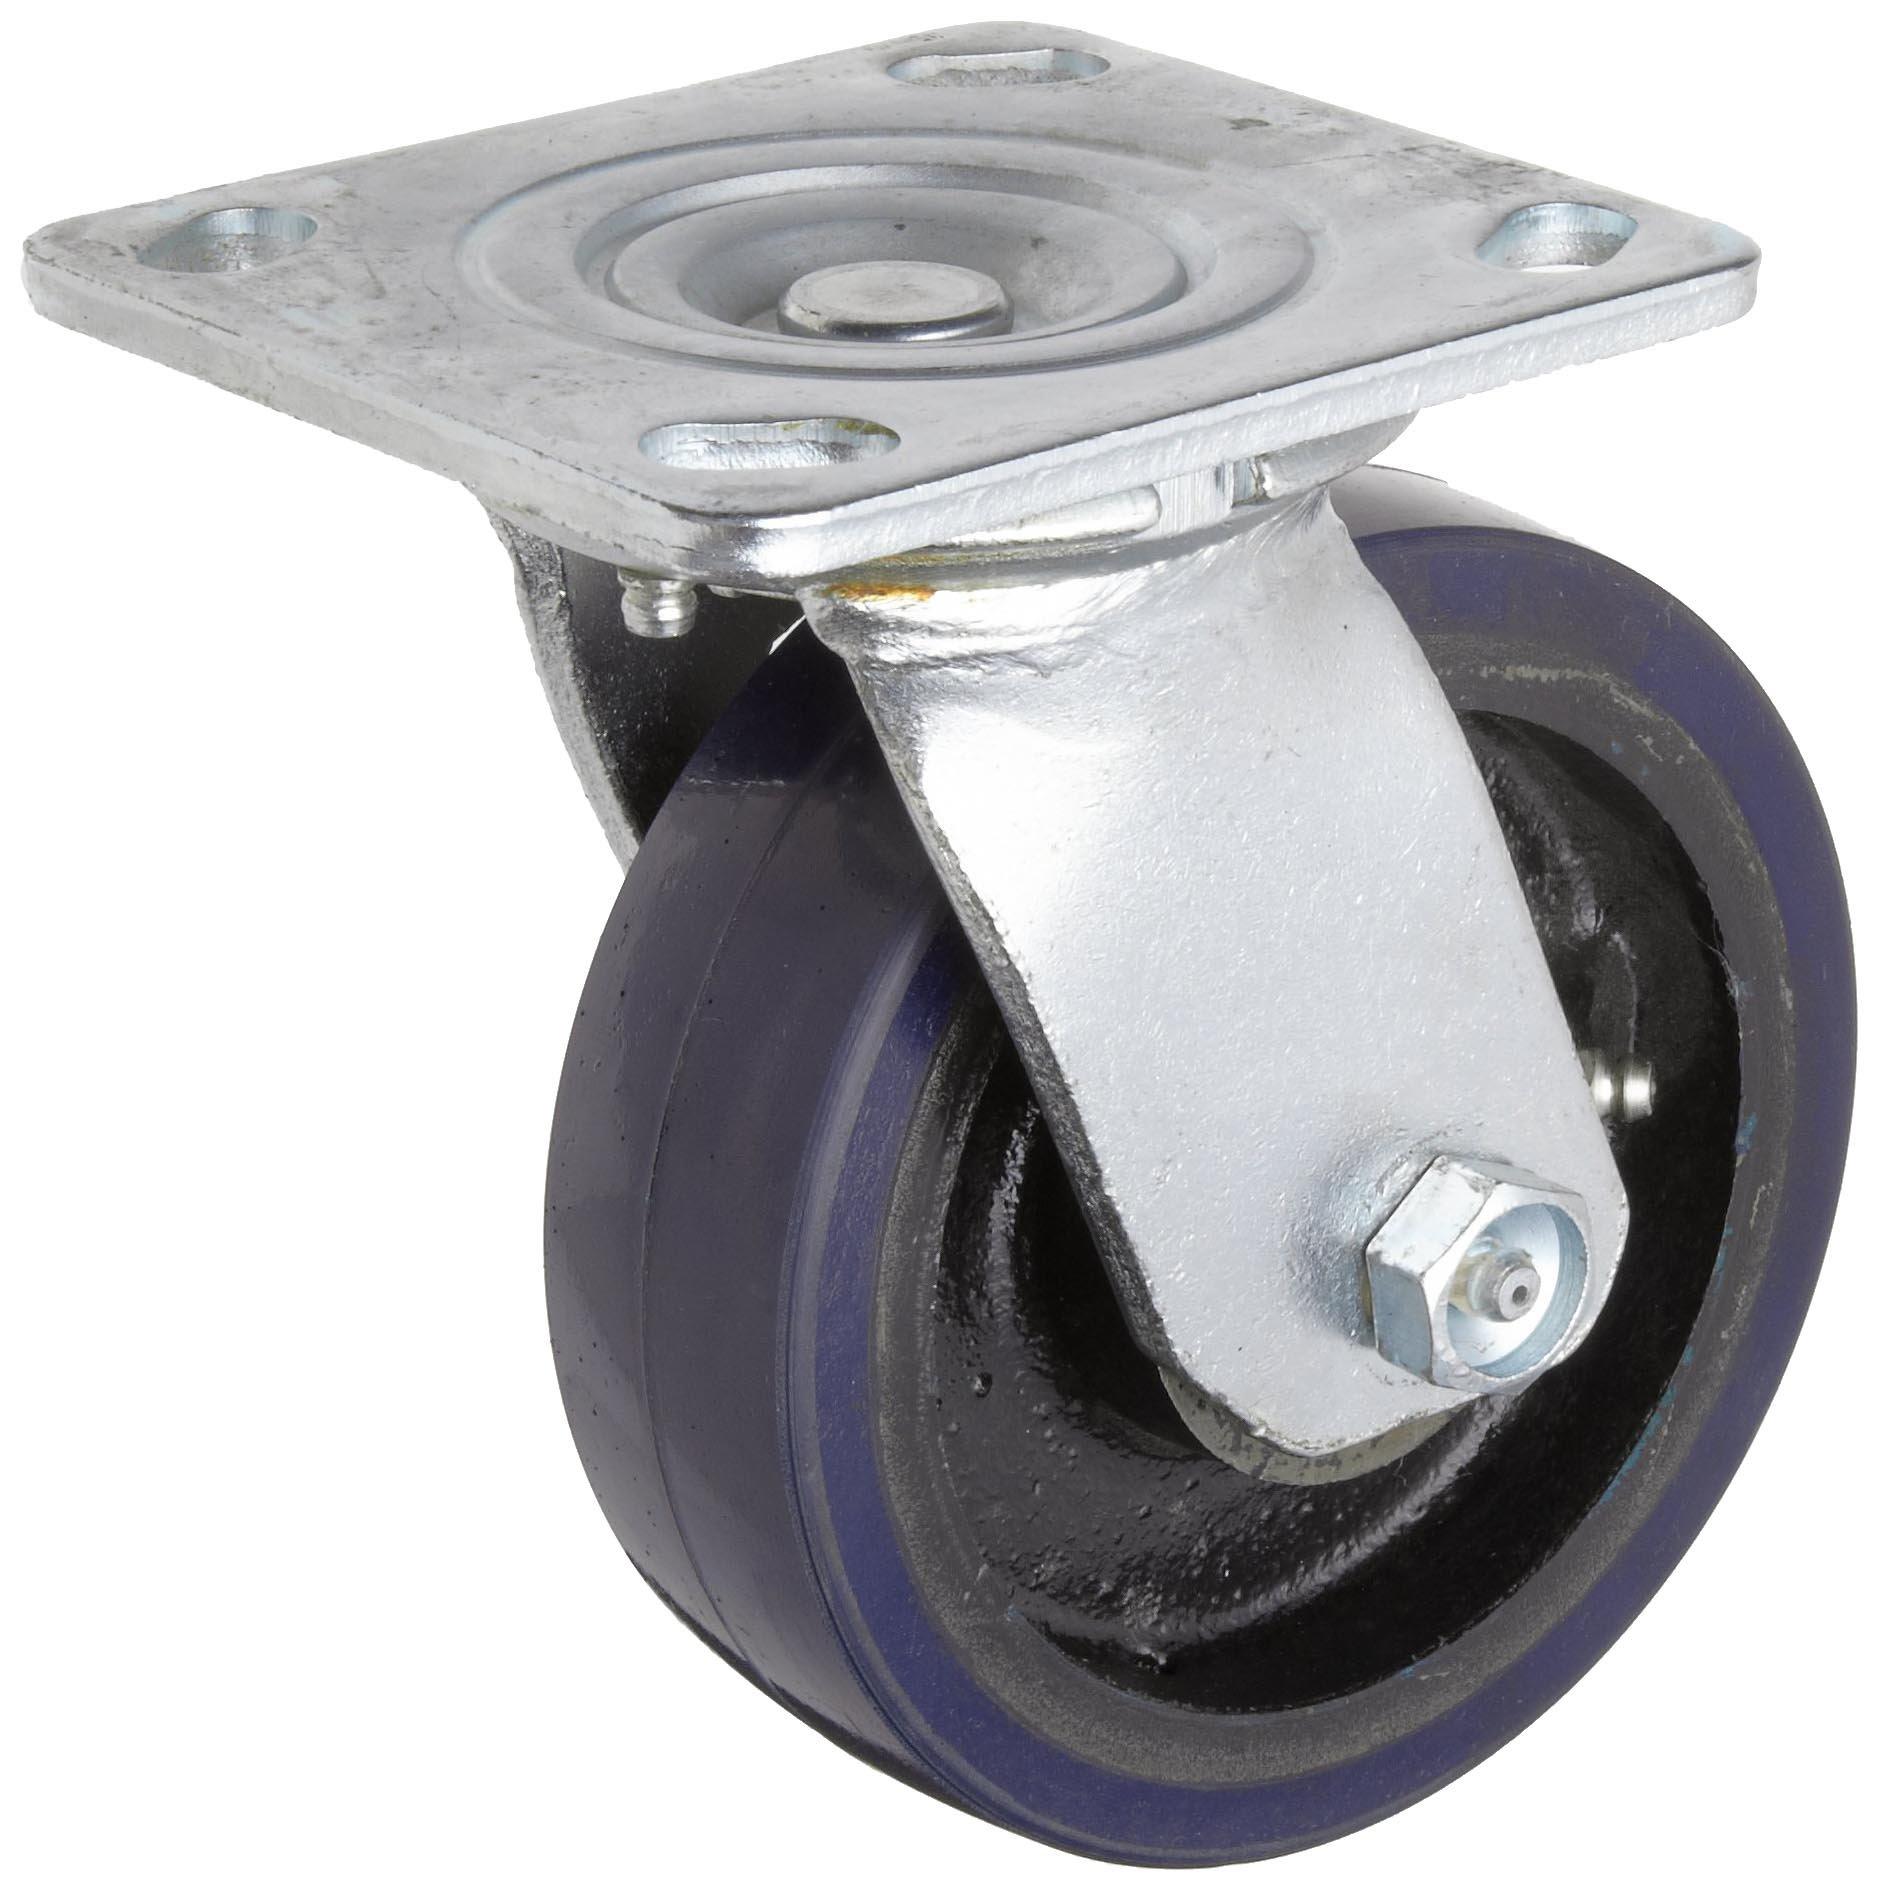 RWM Casters 40 Series Plate Caster, Swivel, Urethane on Aluminum Wheel, Roller Bearing, 720 lbs Capacity, 5'' Wheel Dia, 1-1/2'' Wheel Width, 6-1/8'' Mount Height, 4-1/2'' Plate Length, 4'' Plate Width